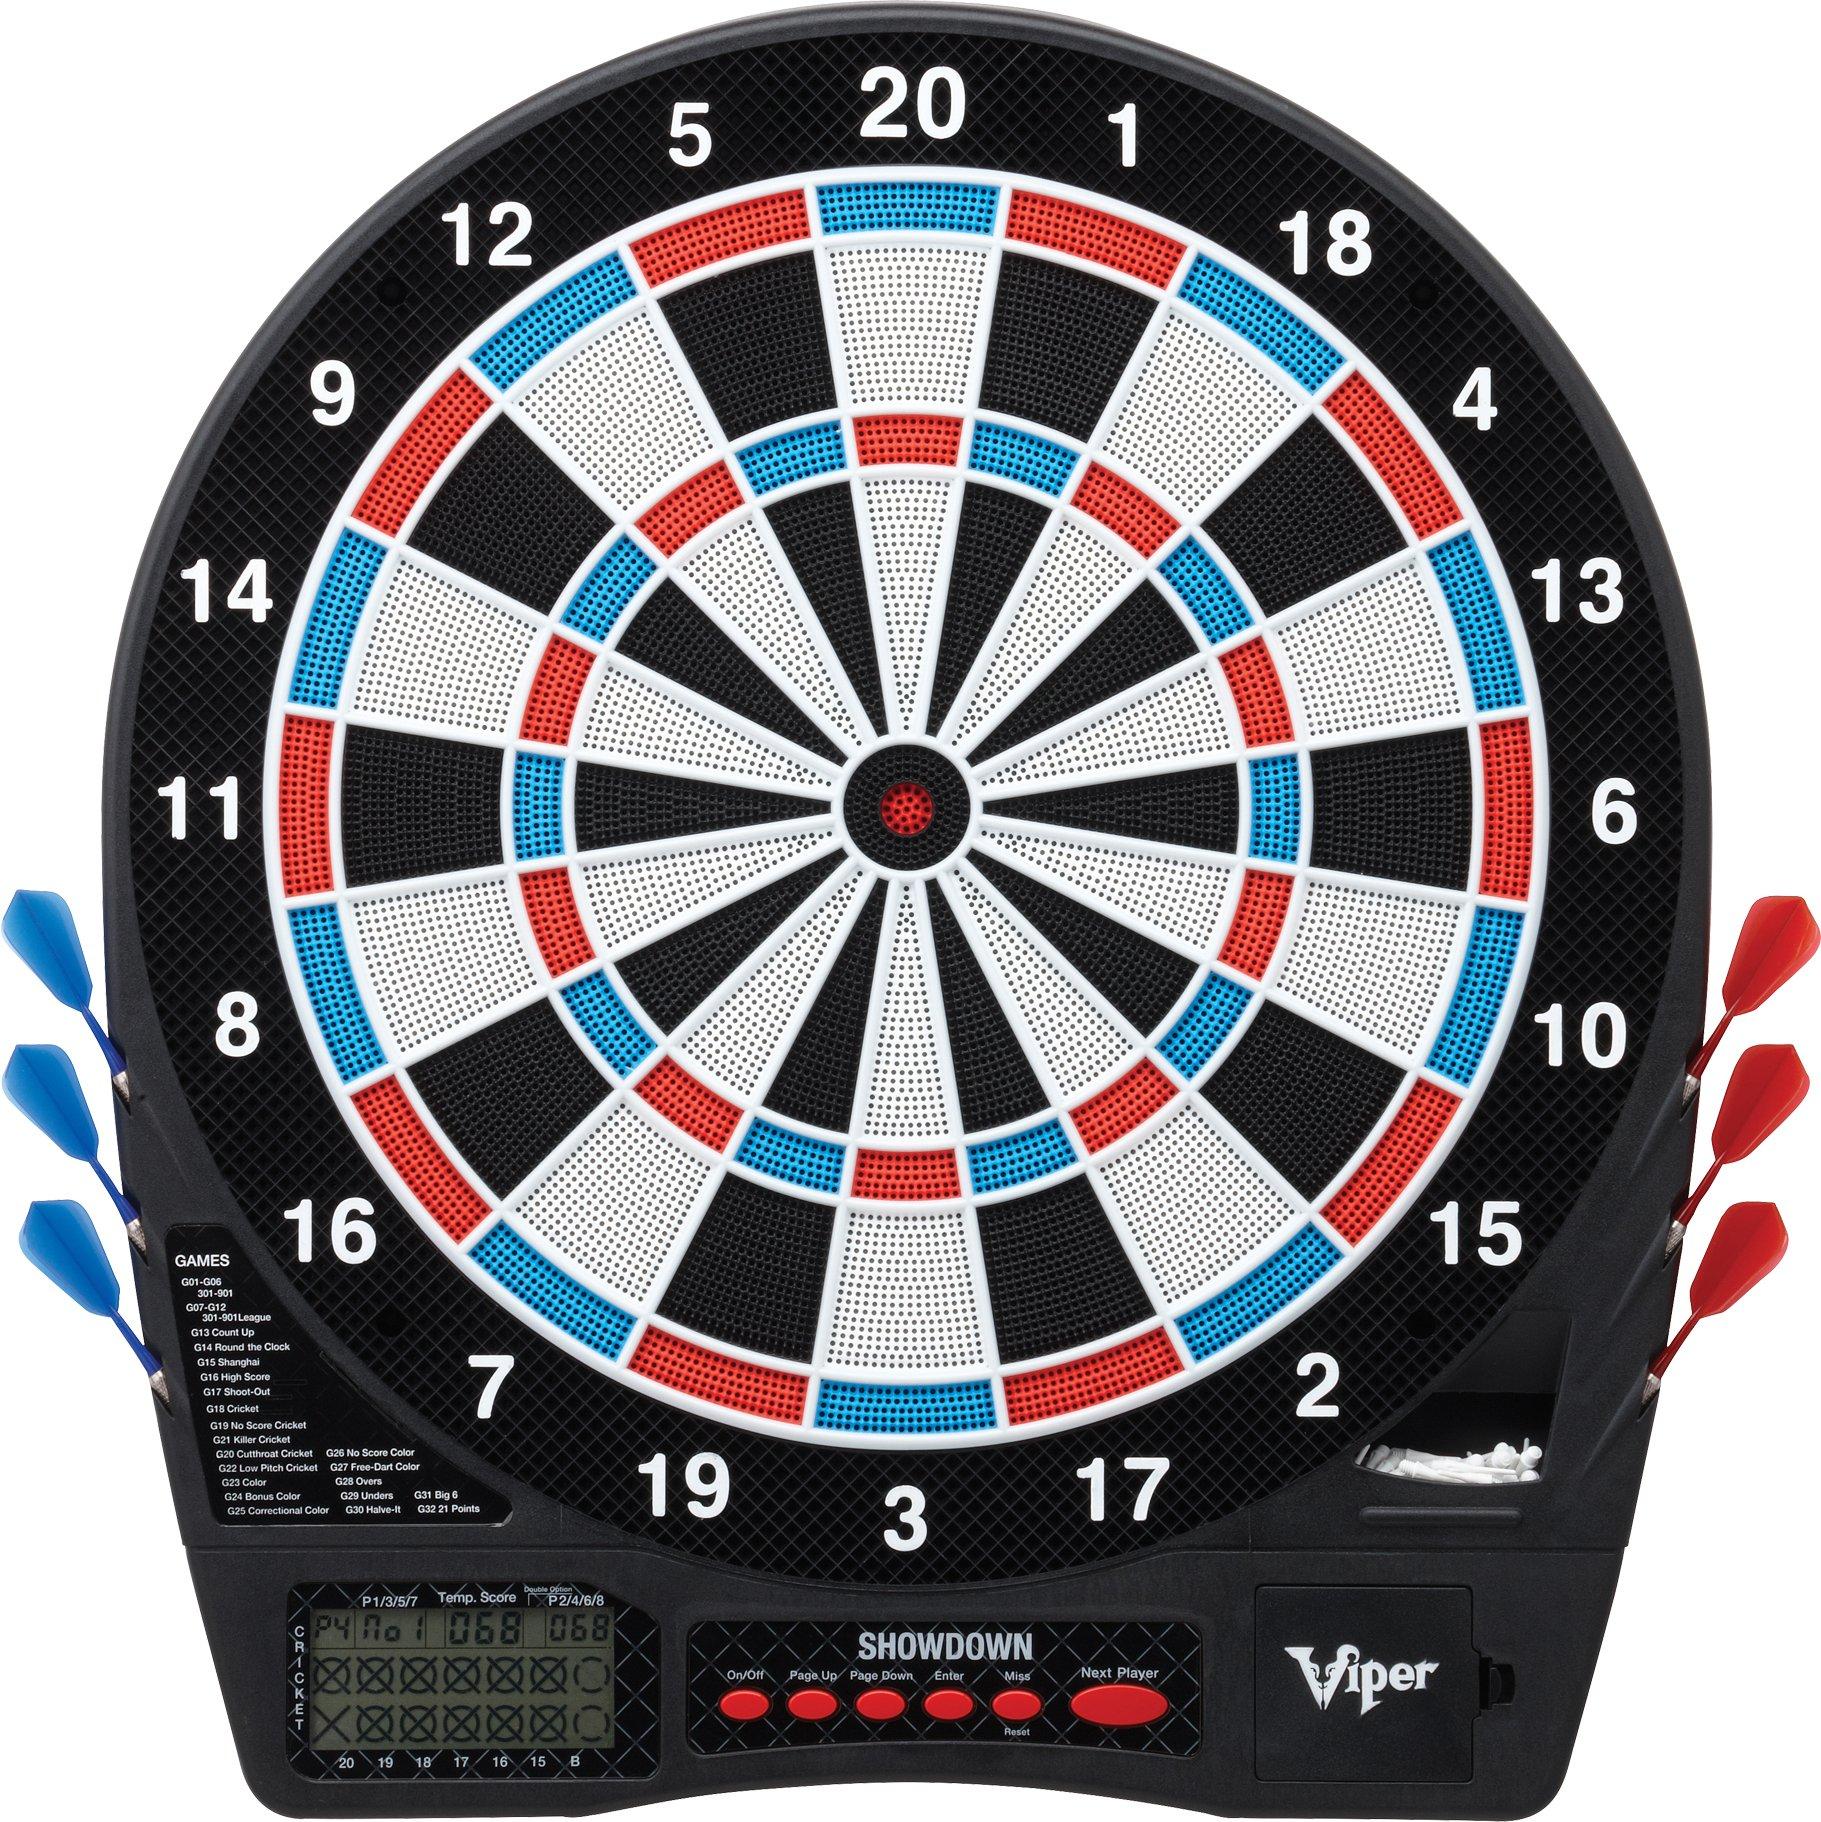 Viper Showdown Electronic Soft Tip Dartboard